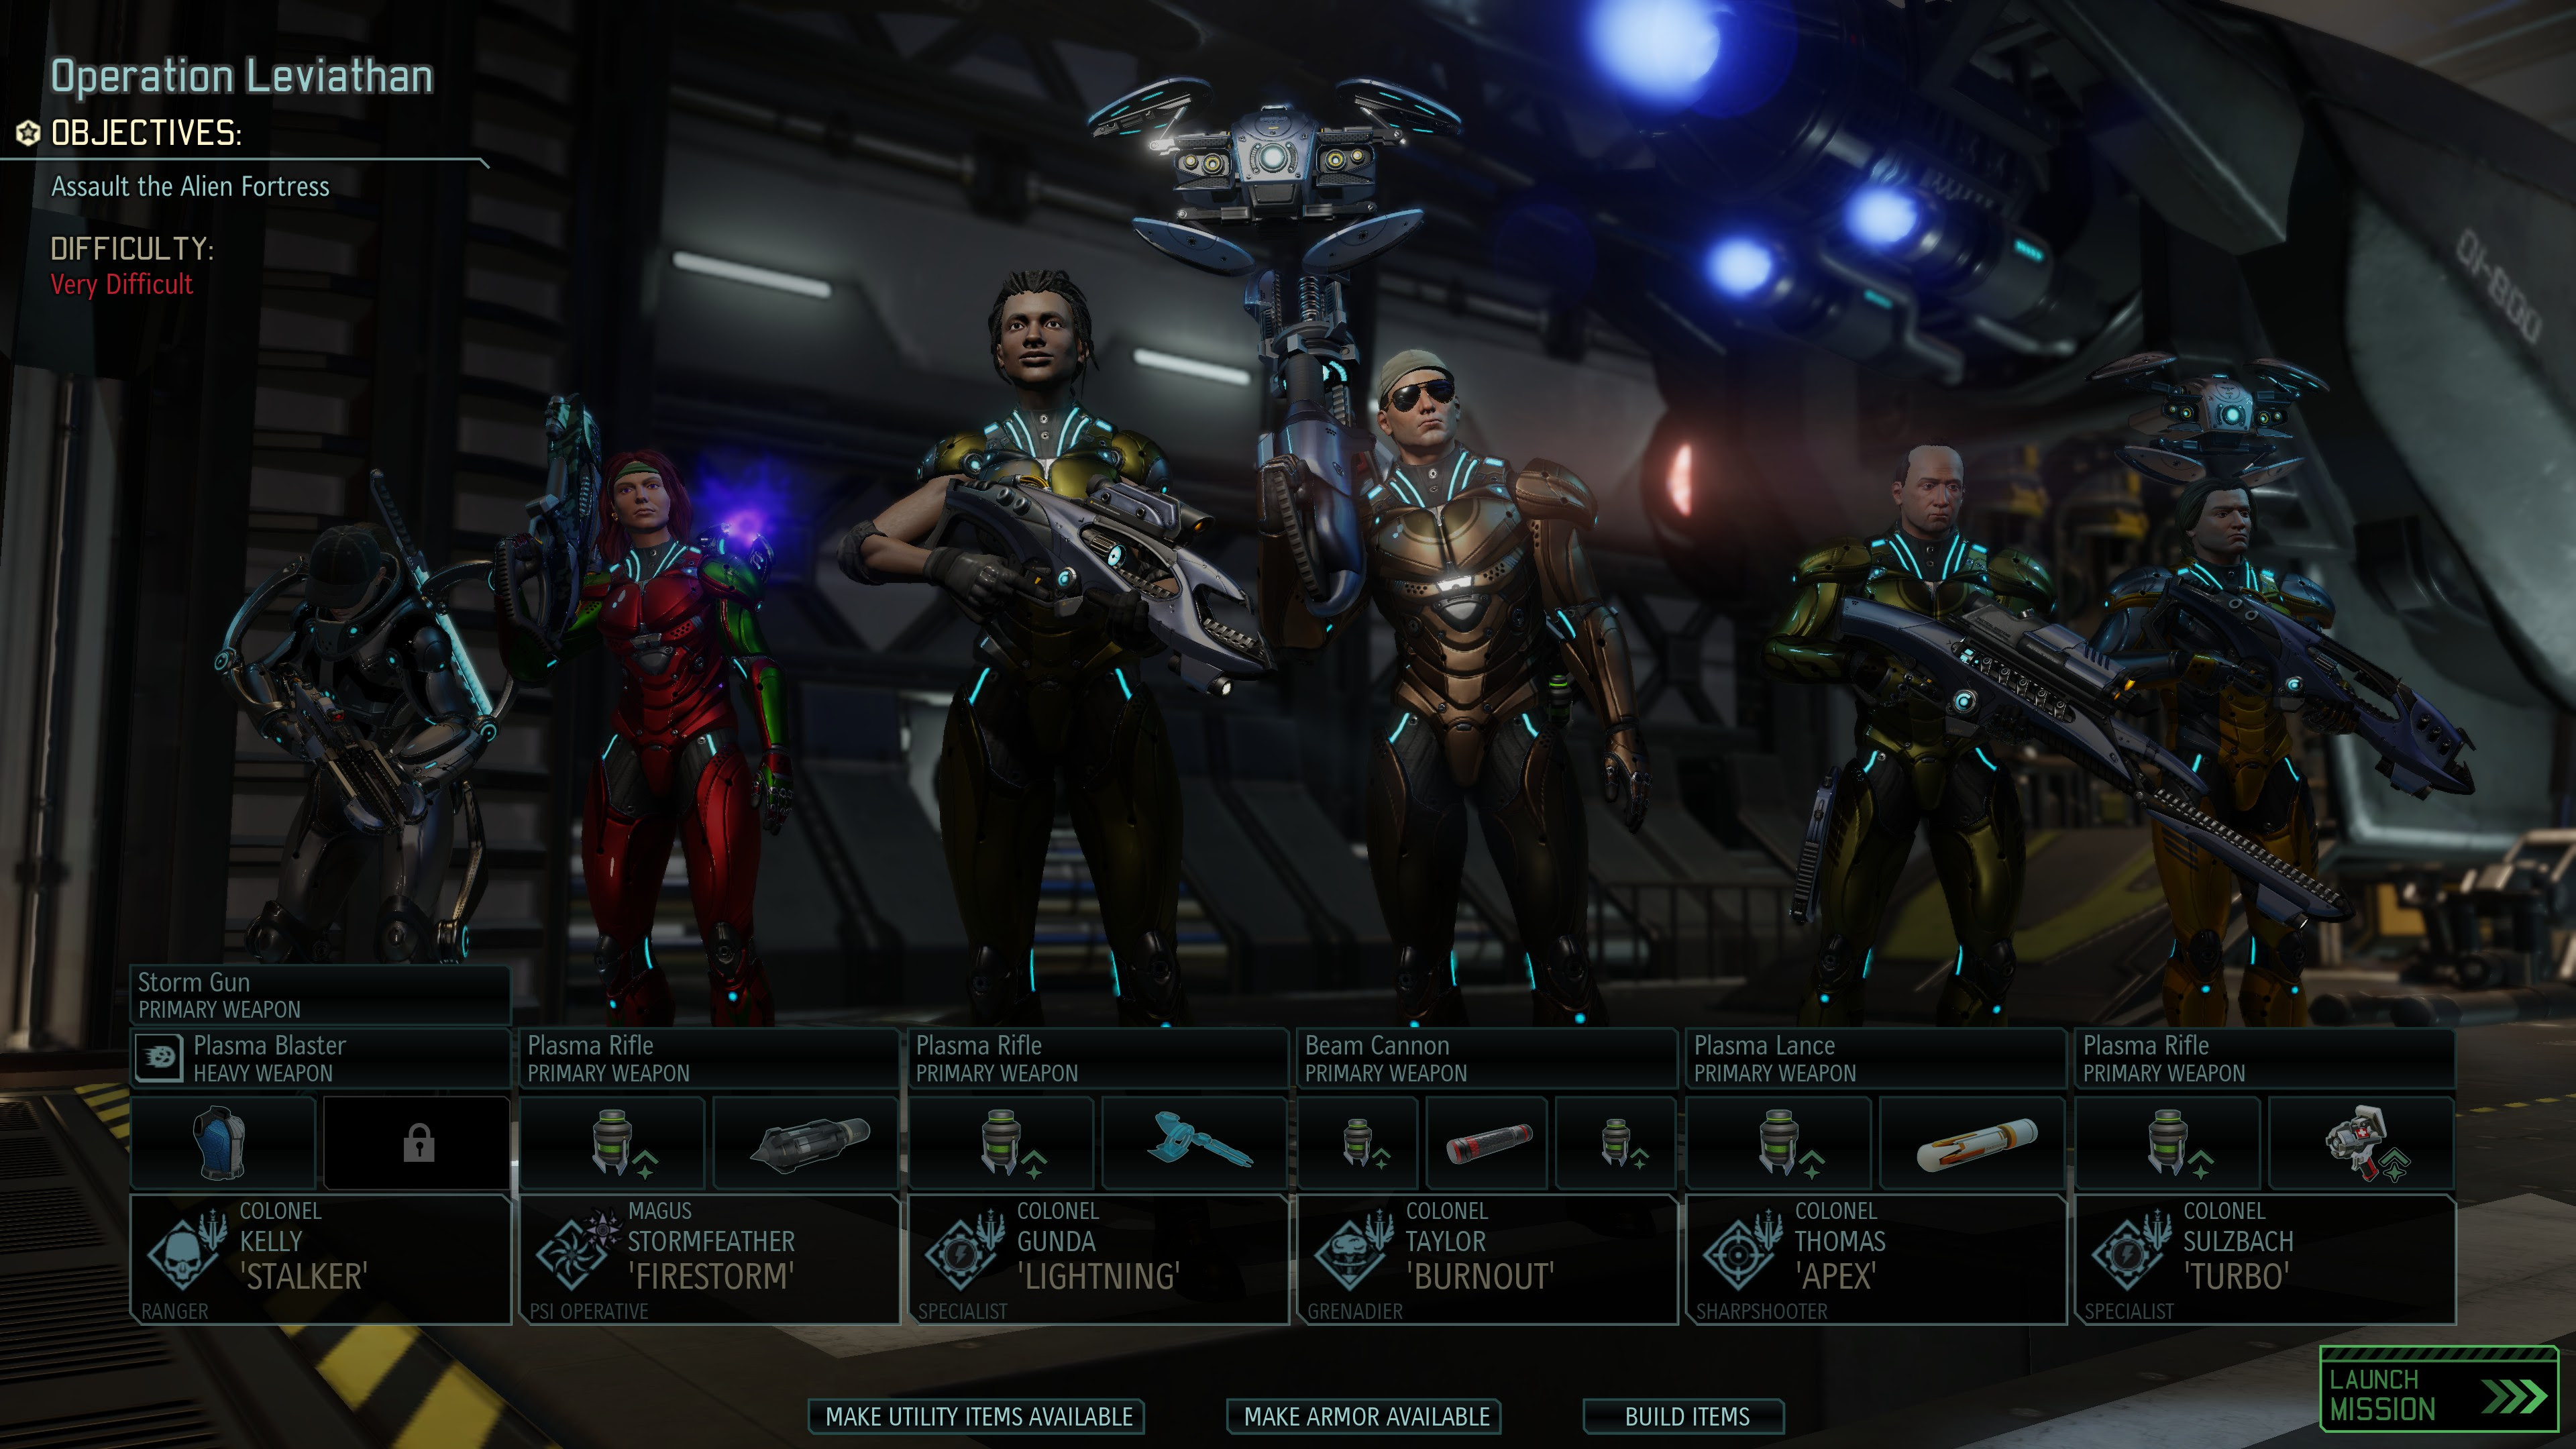 Vigilo Confido Commander Xcom 2 Does So Much Right A